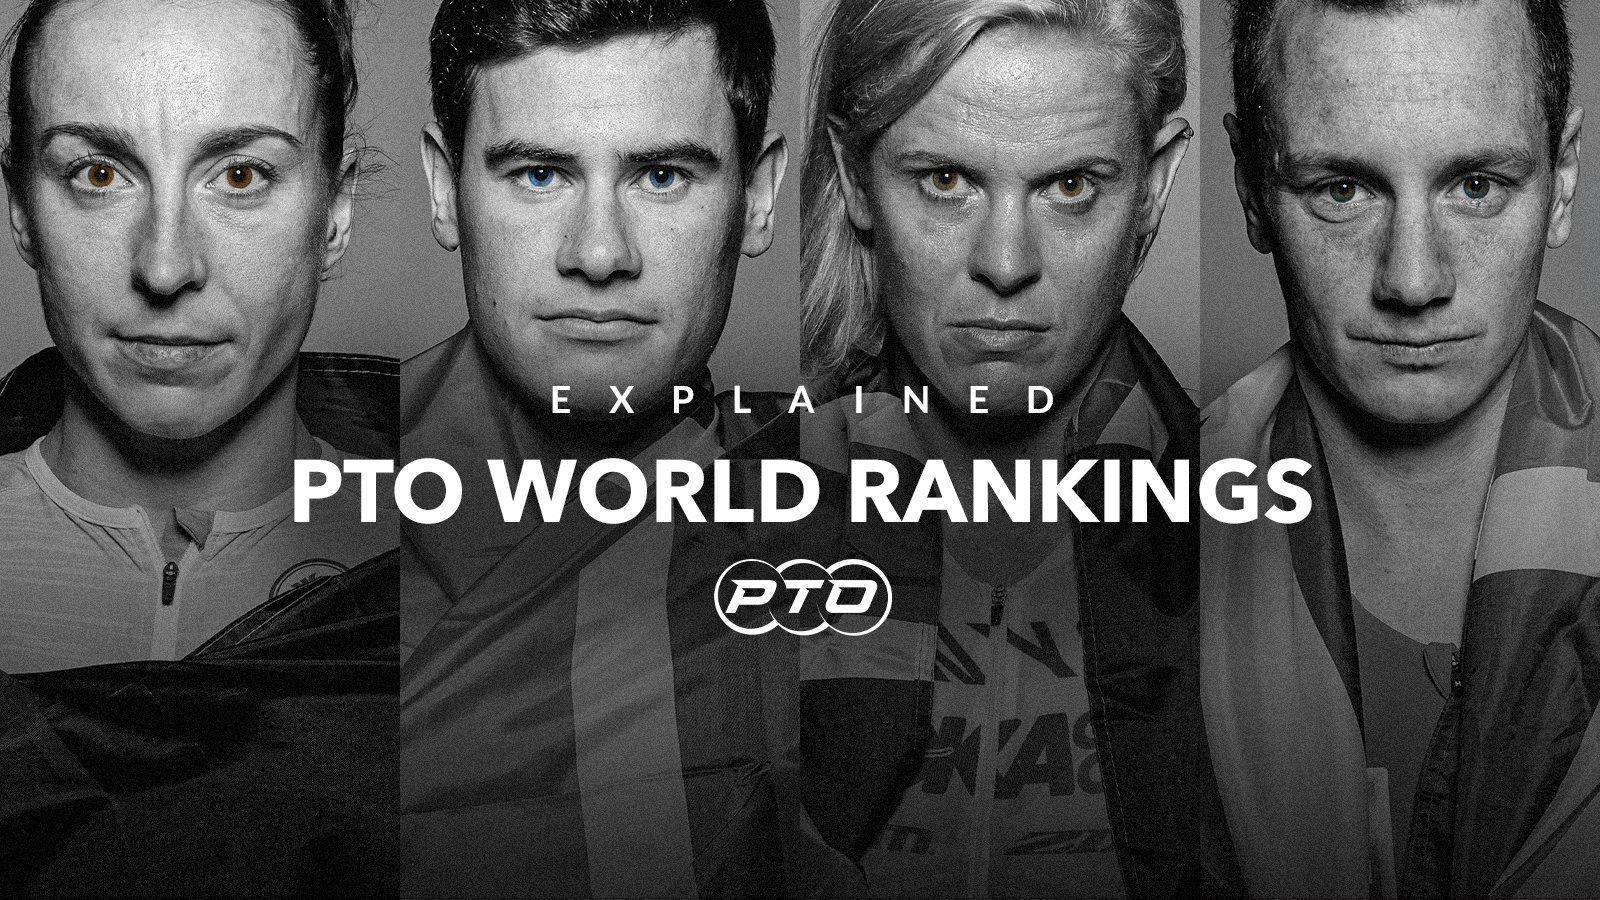 PTO World Rankings Explained